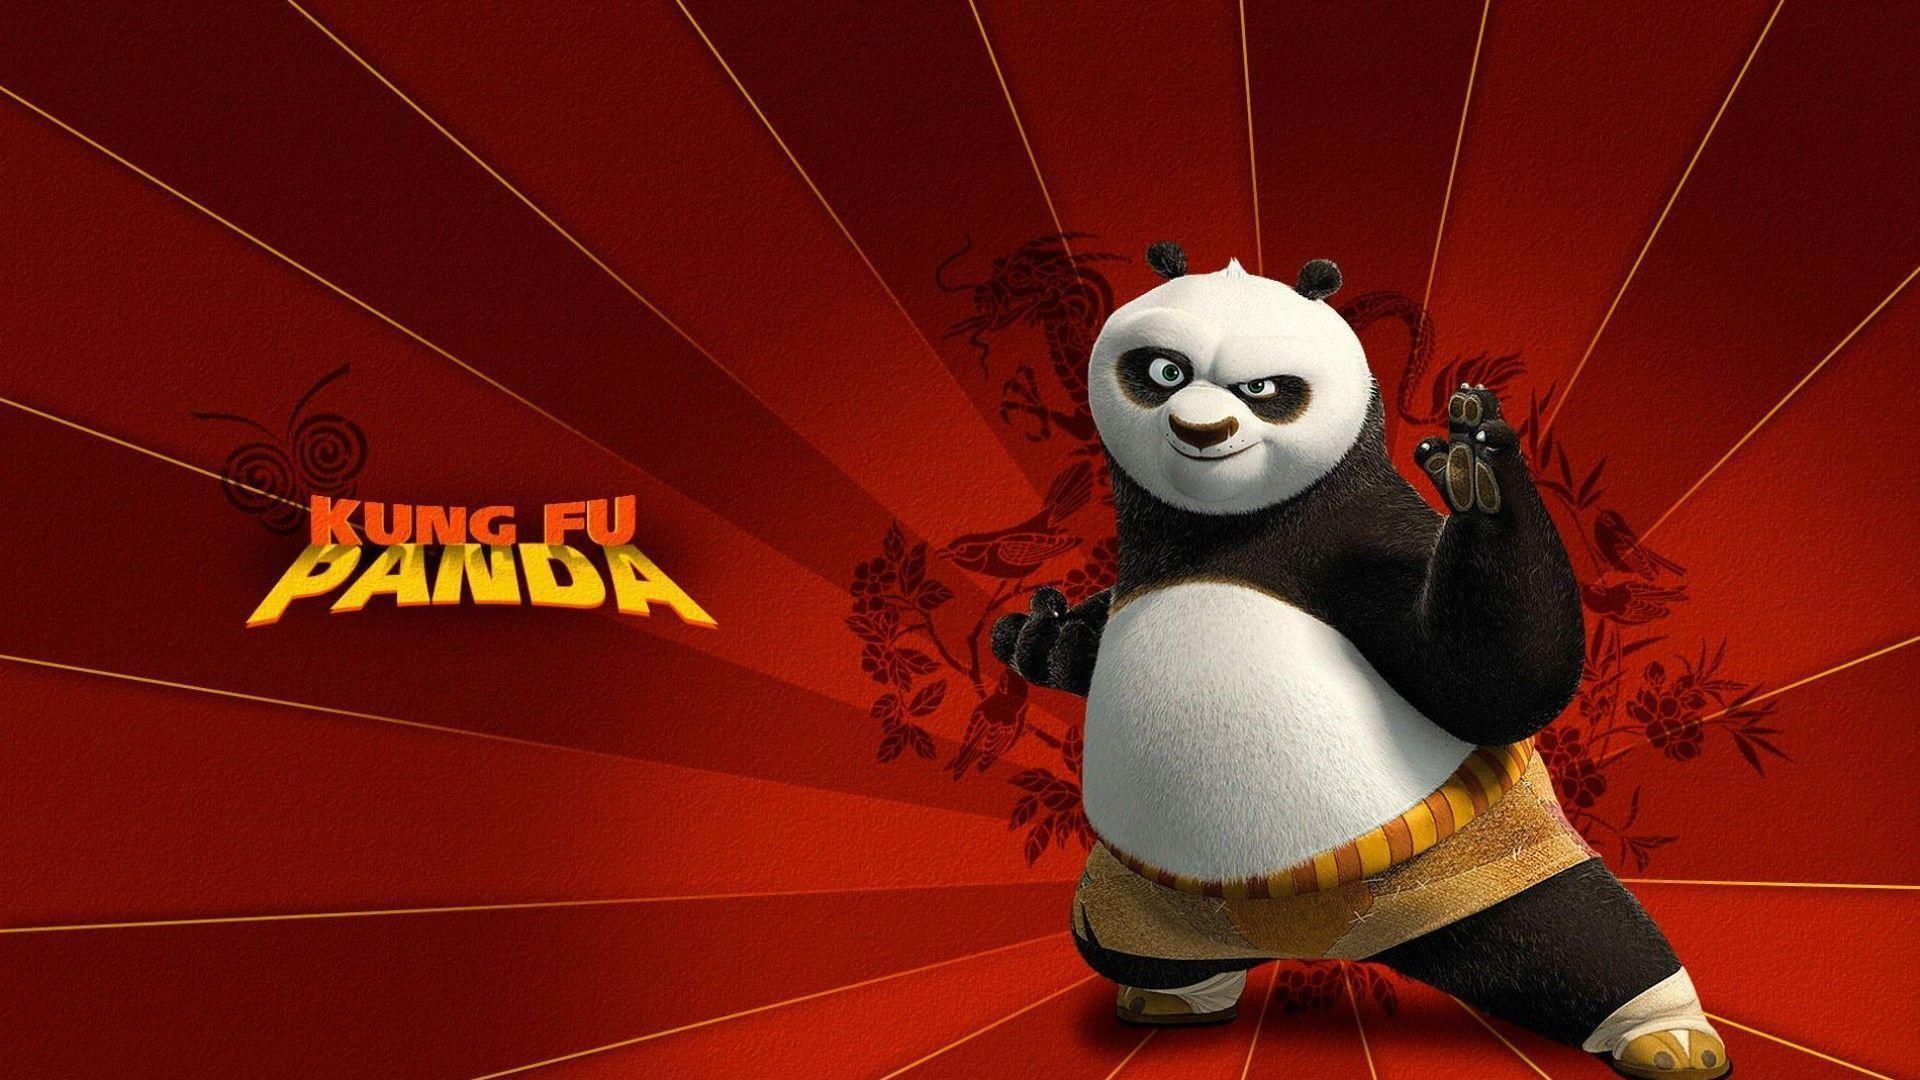 Kung Fu Panda Hd Wallpapers